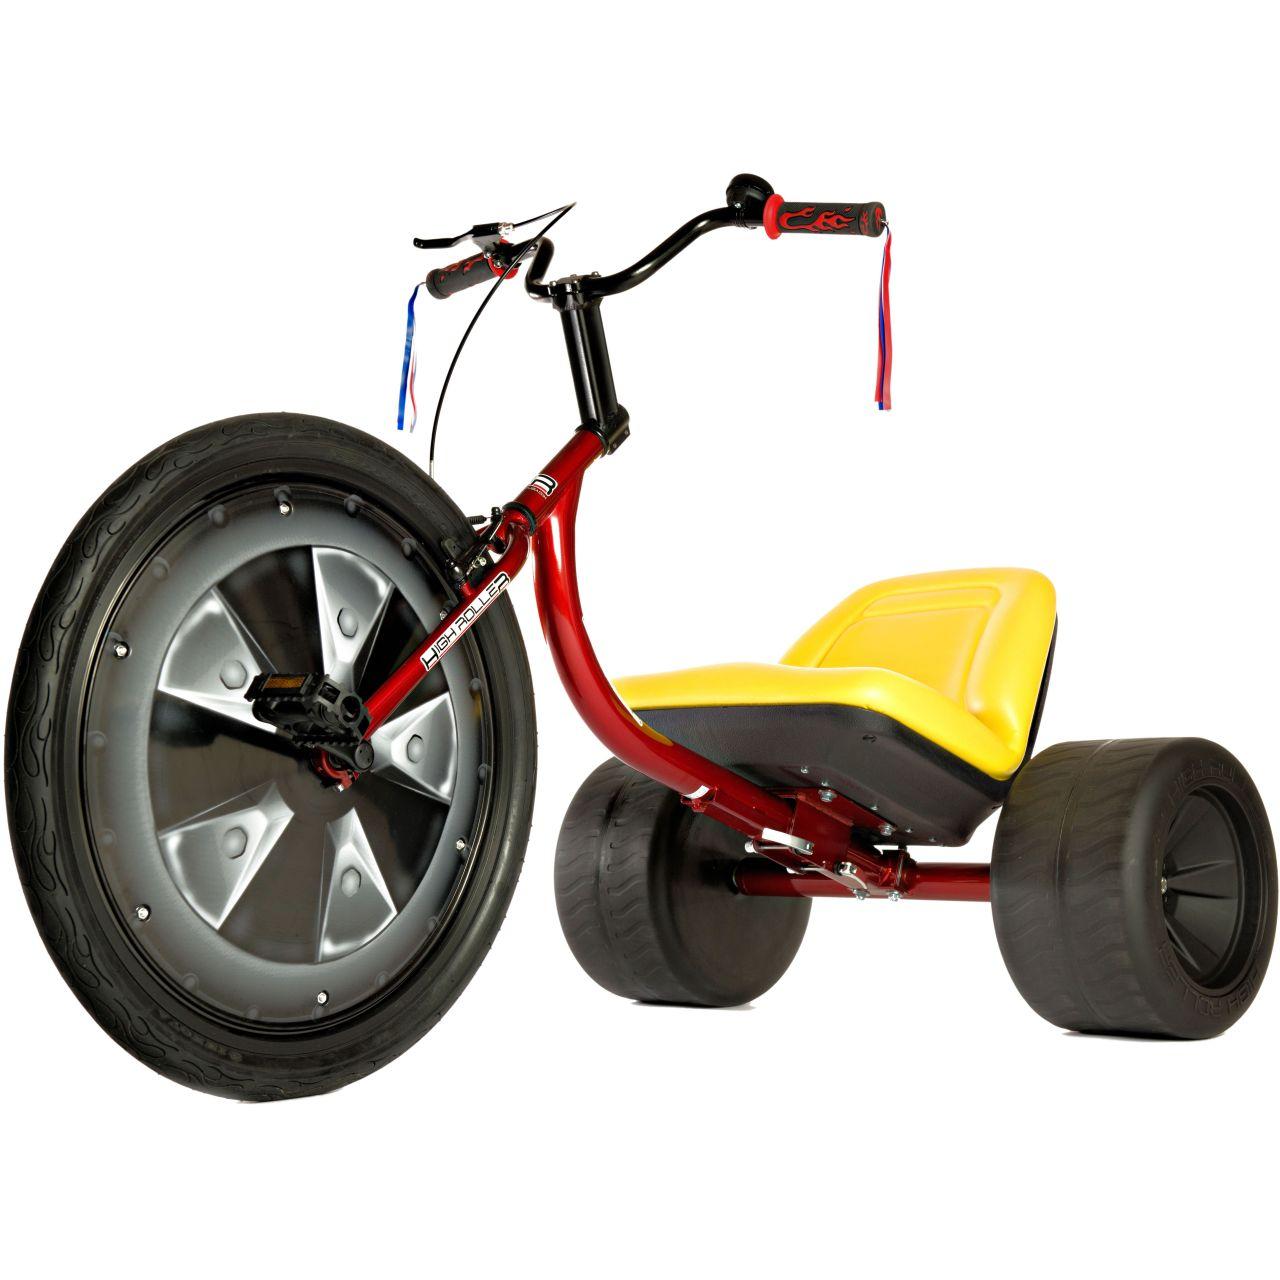 Adult big wheels